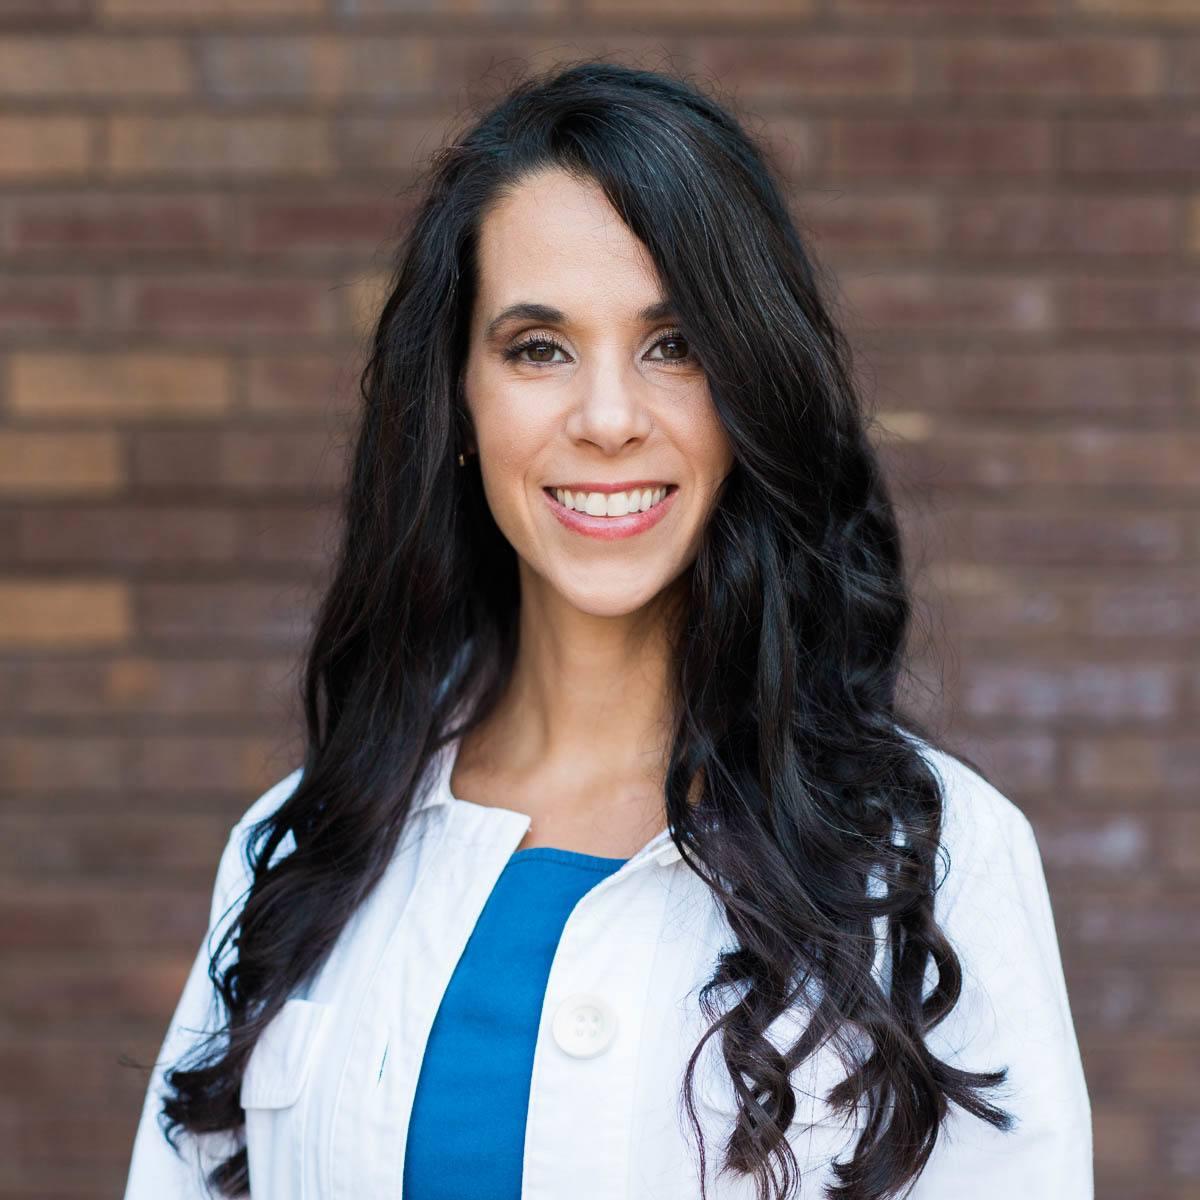 Natesha Vaillancourt ARNP, CNM - Dr. Raymond J. Marquette M.D. Obstetrics and Gynecology Ocala Florida Provider